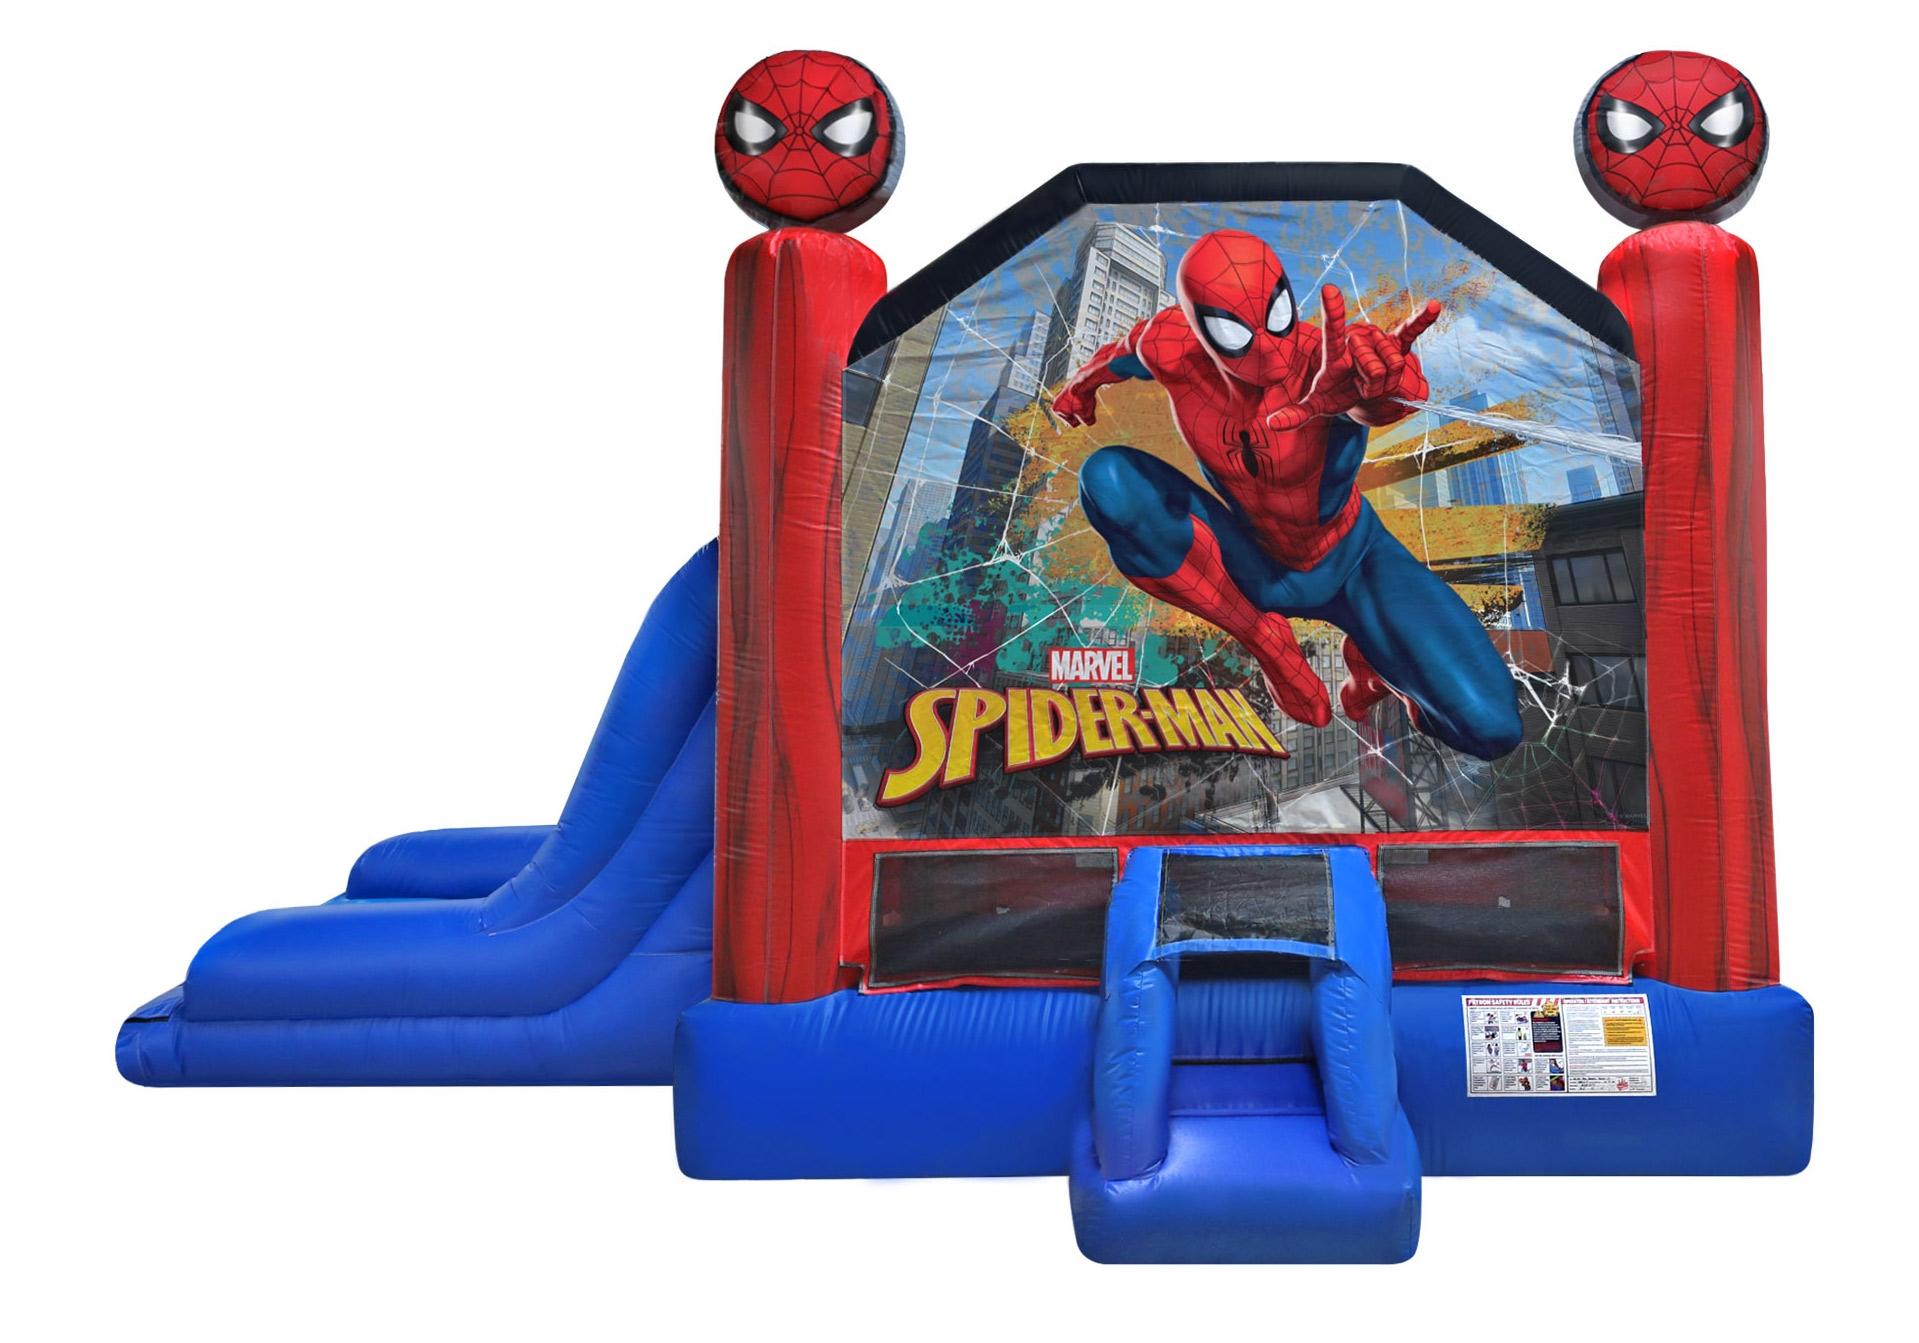 Spiderman Jumphouse